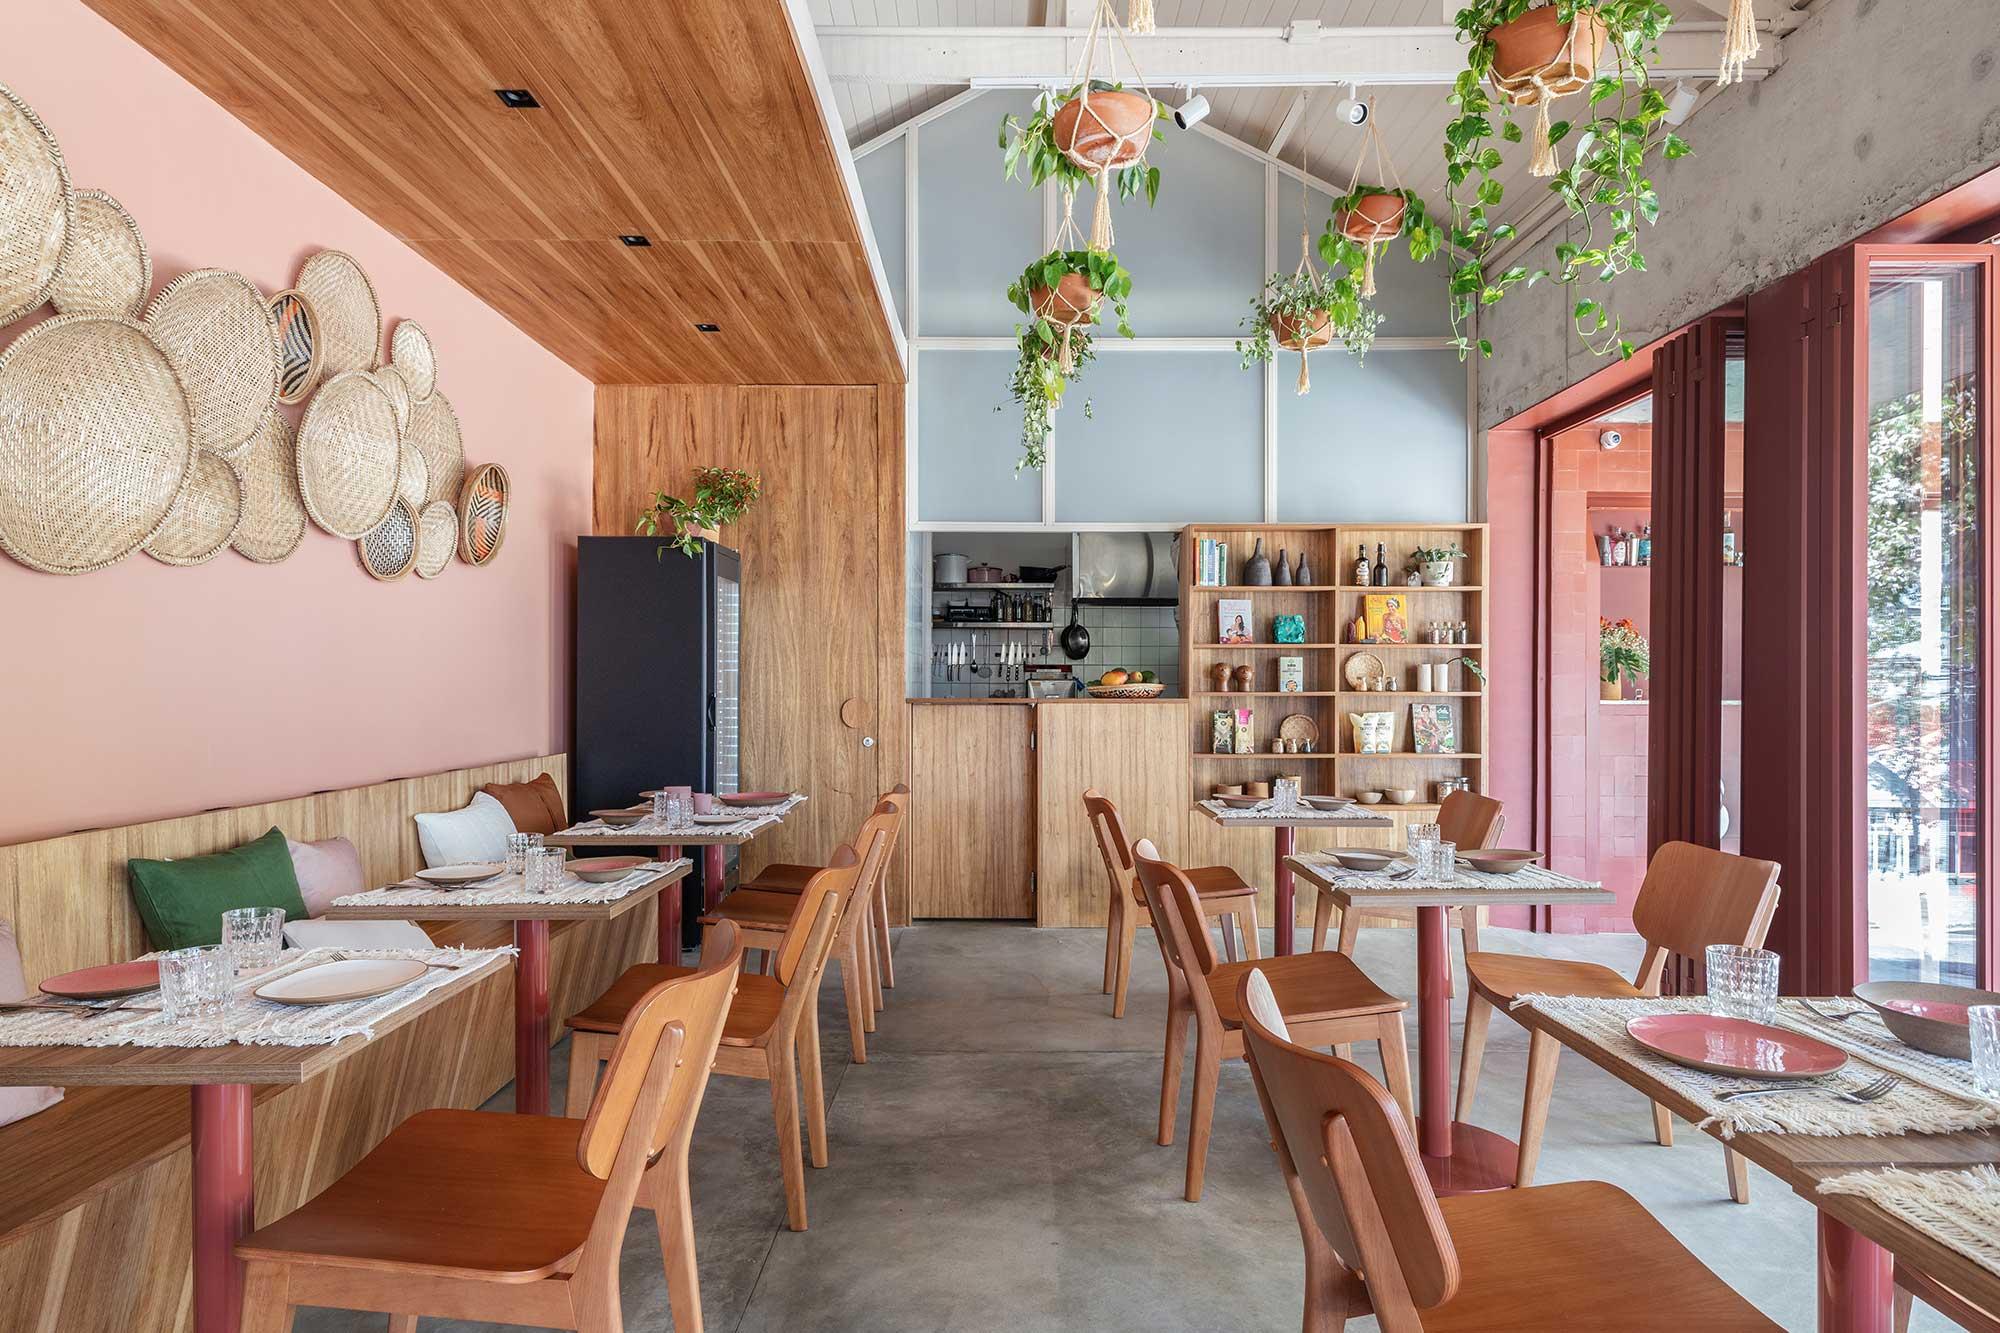 restaurante camelia ododo nathalia favaro ana guedelha bela gil vila madalena